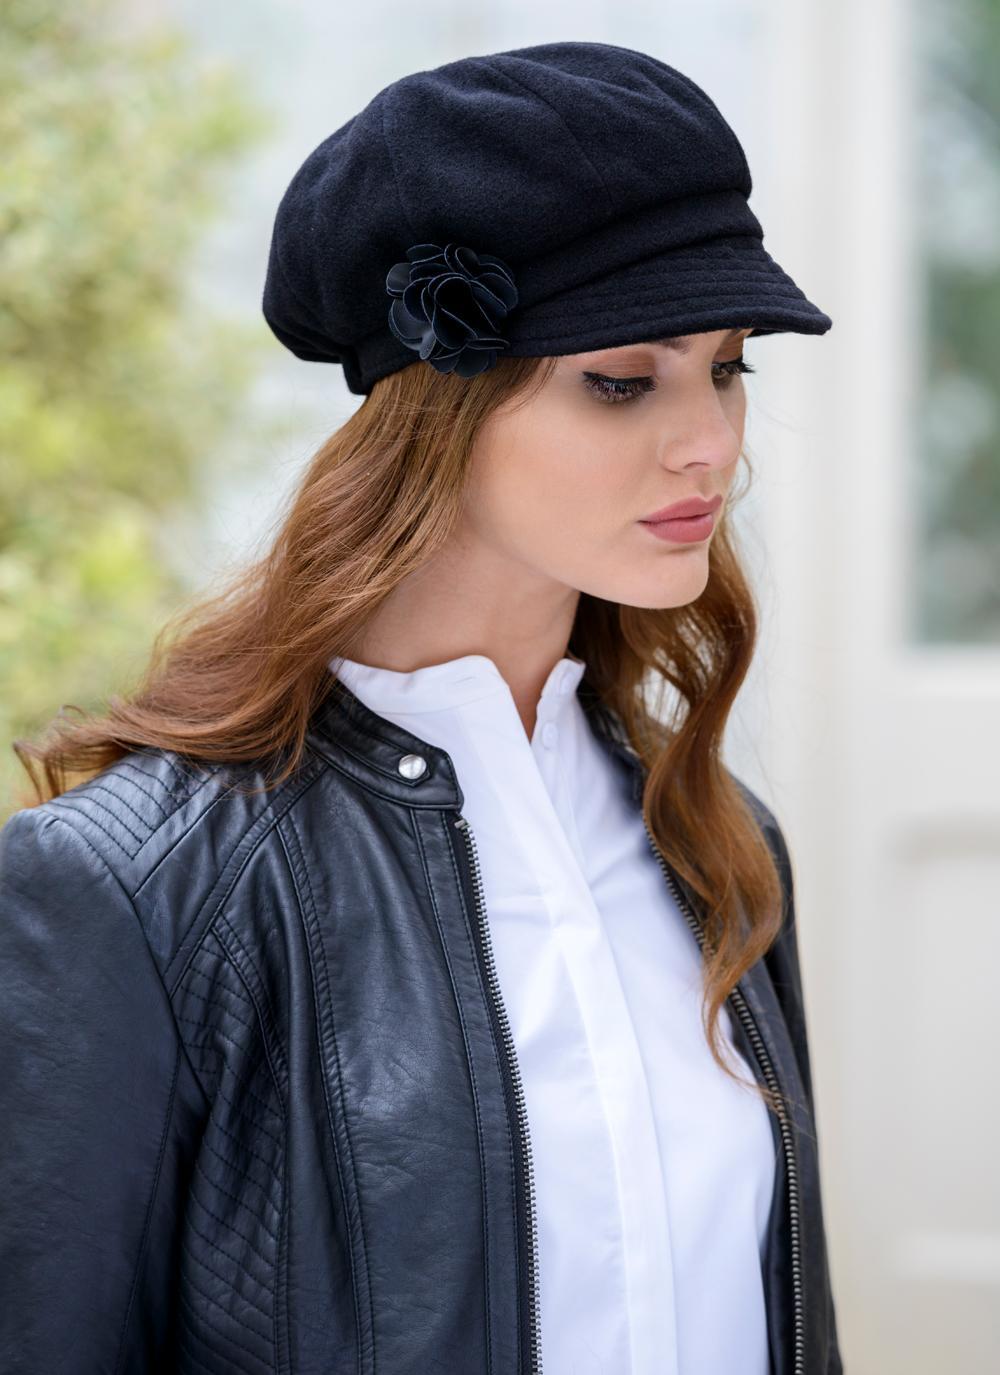 a86ed92ab5008d Flat Cap & Newspaper Boy Hat Style Guide — Gentleman's Gazette